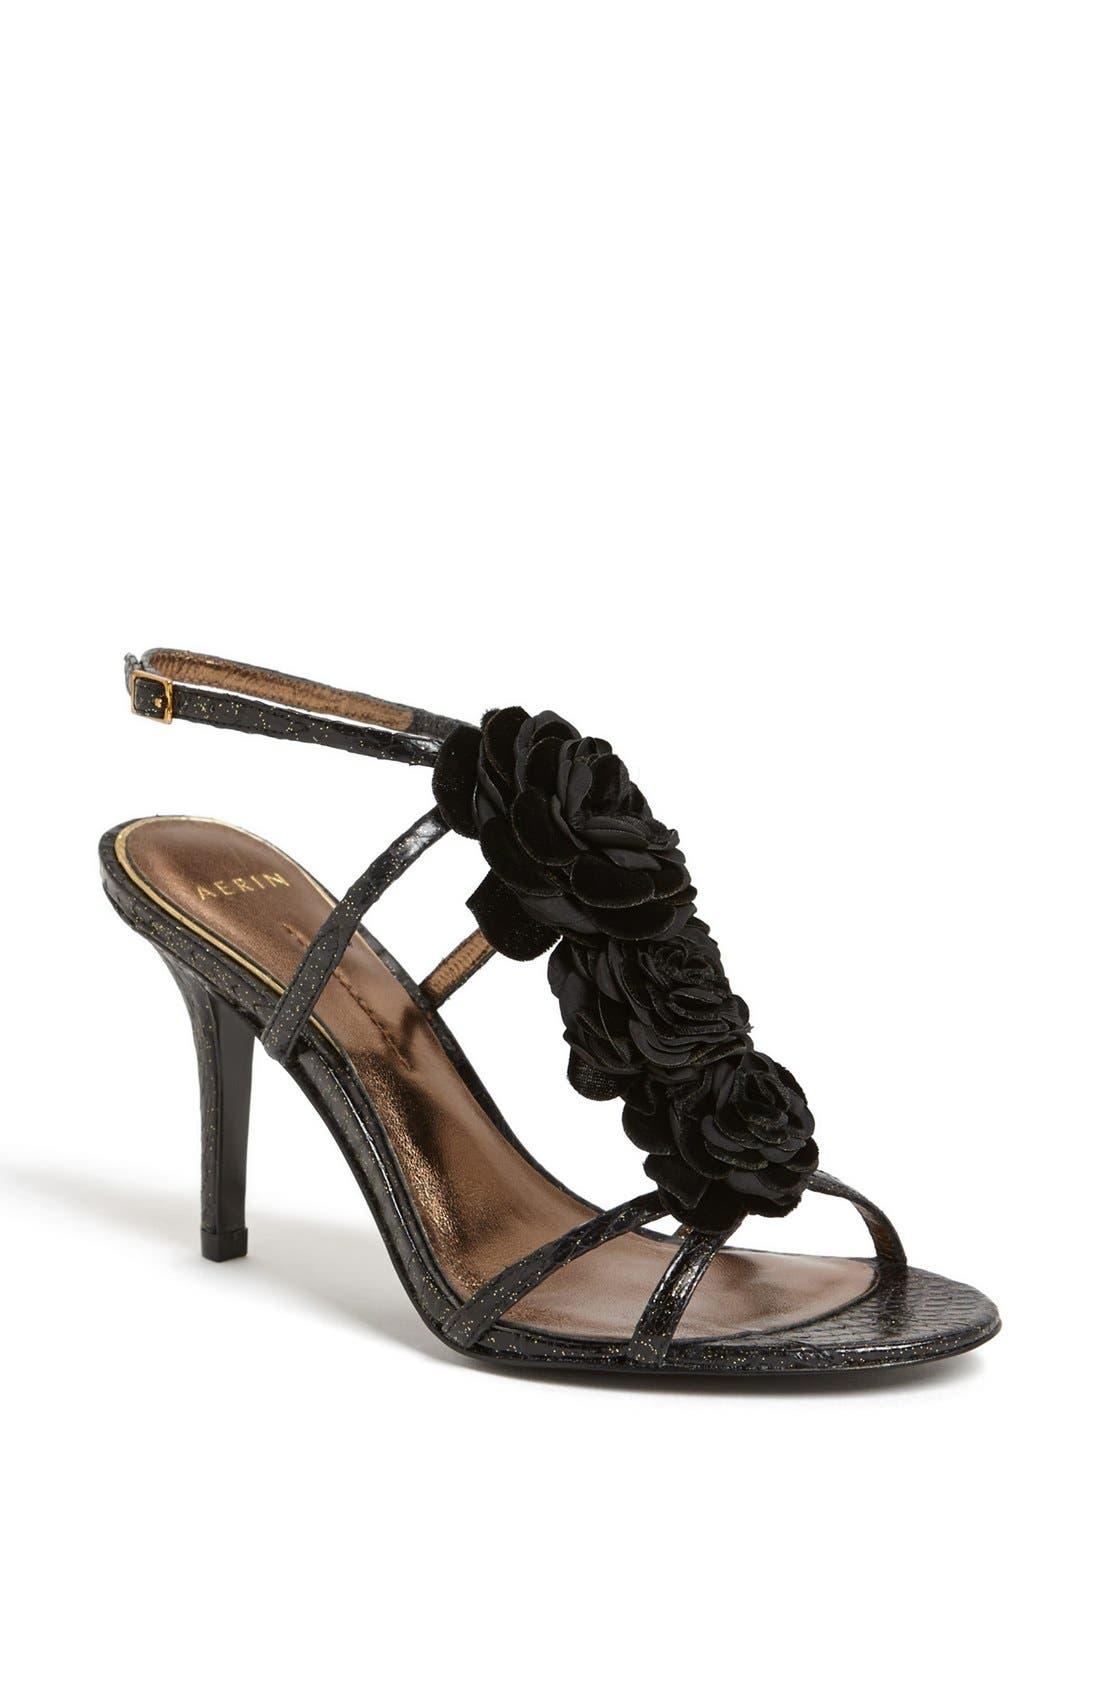 Alternate Image 1 Selected - Aerin 'Collonade' Sandal